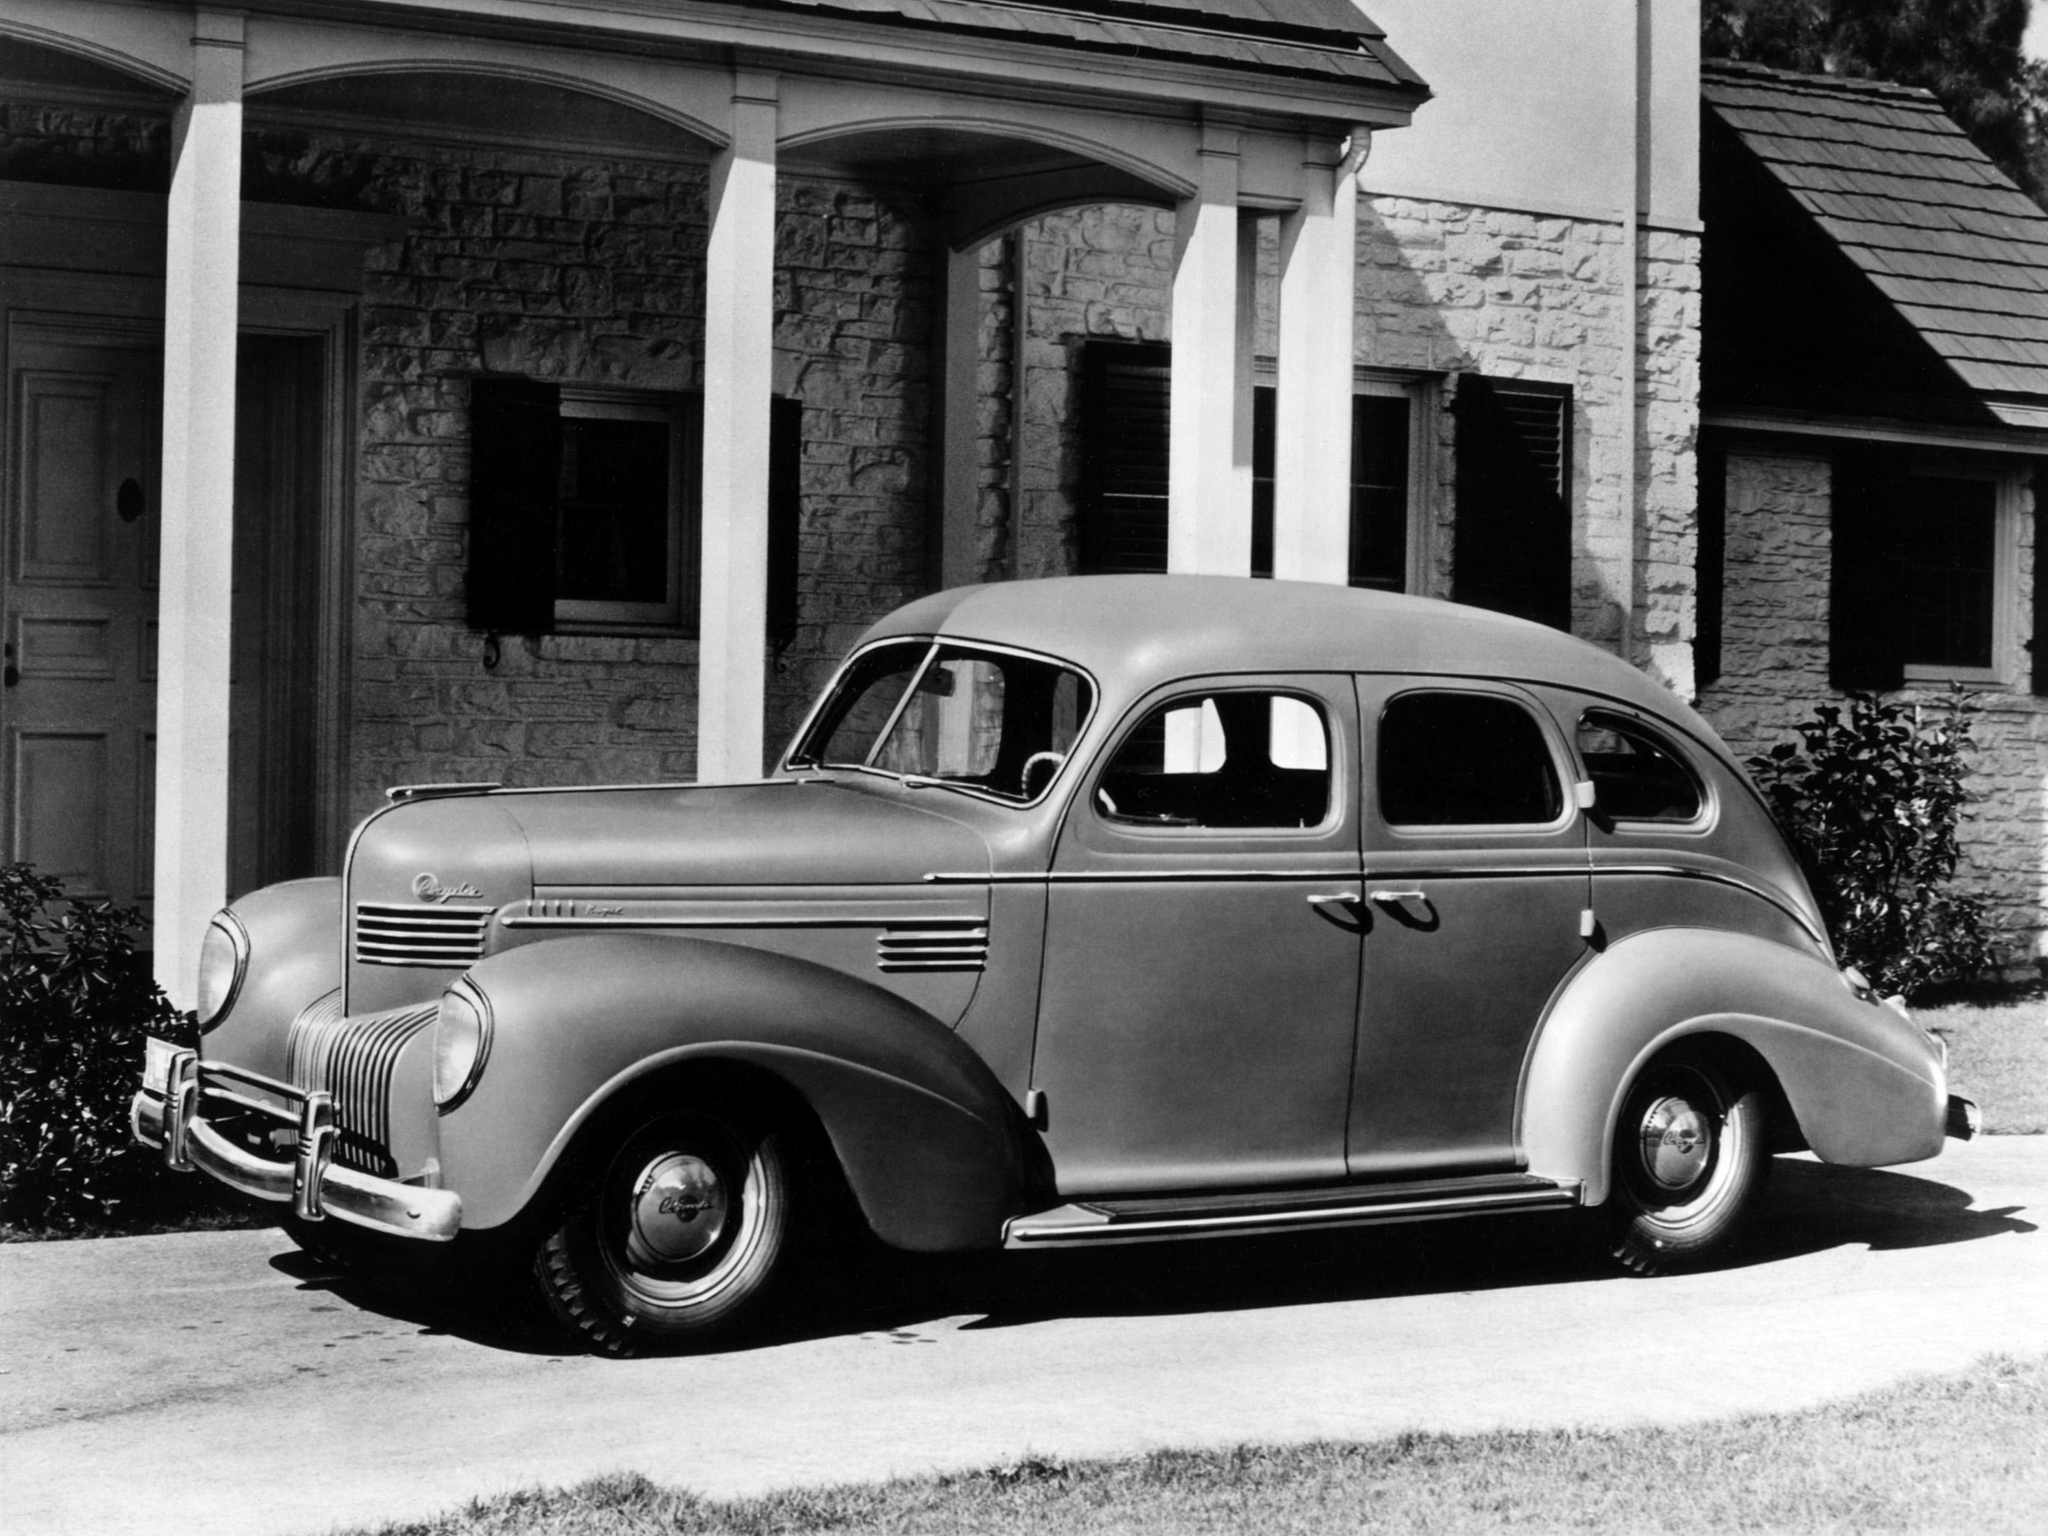 1939 chrysler royal hq - photo #10